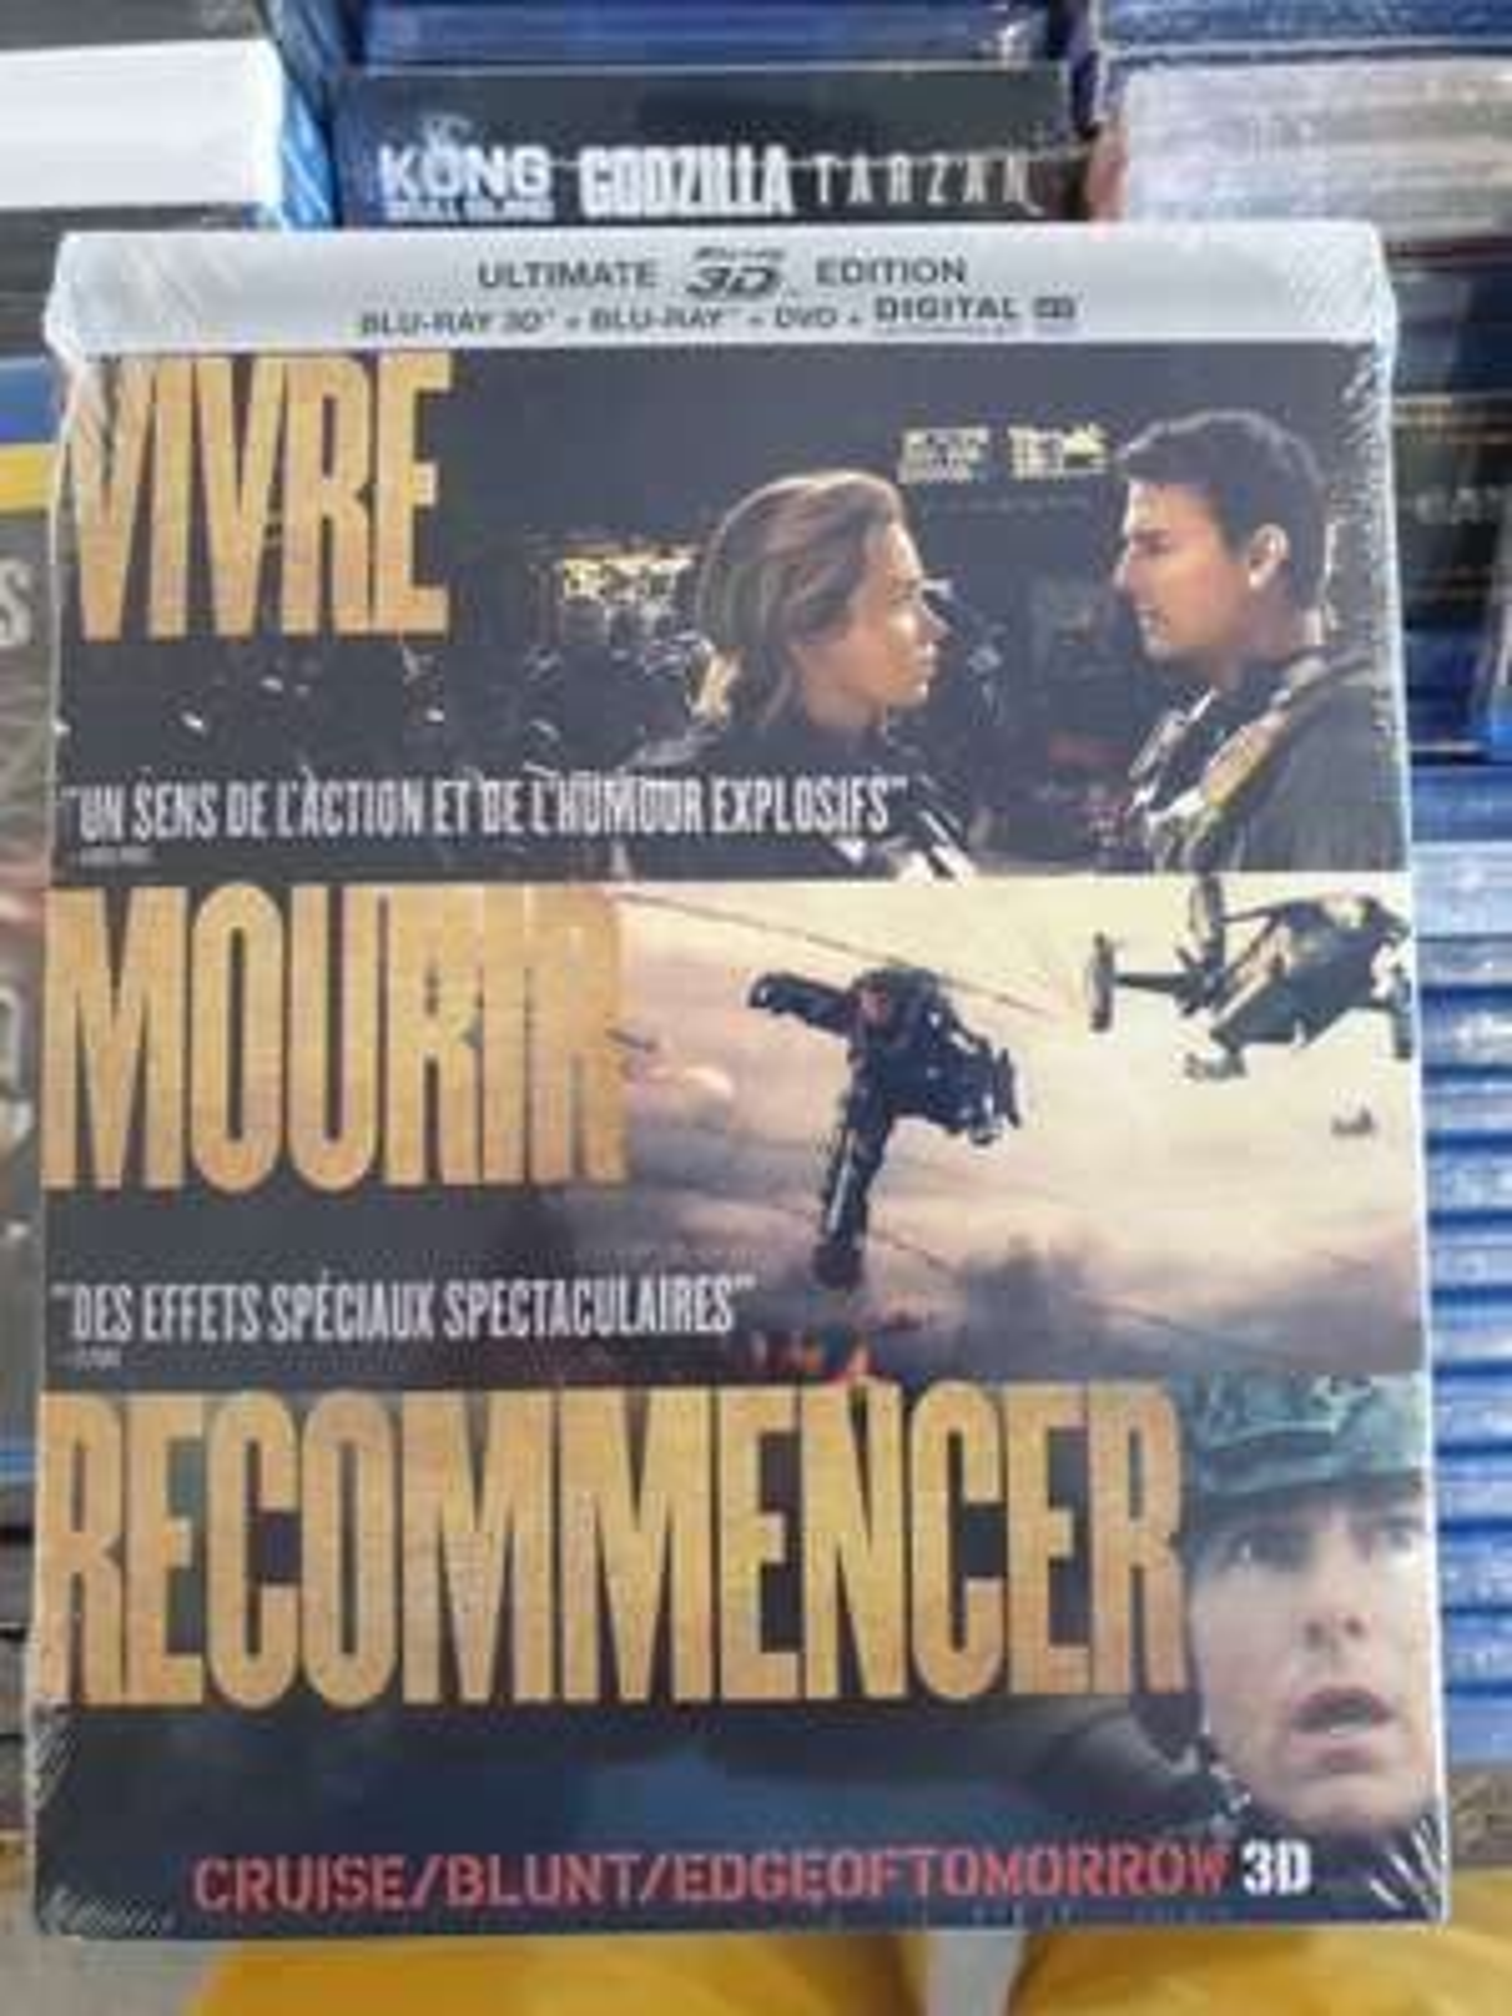 Film Edge of Tomorrow : Ultimate édition (Blu-Ray 3D + Blu-Ray + DVD) - Sélestat (67)